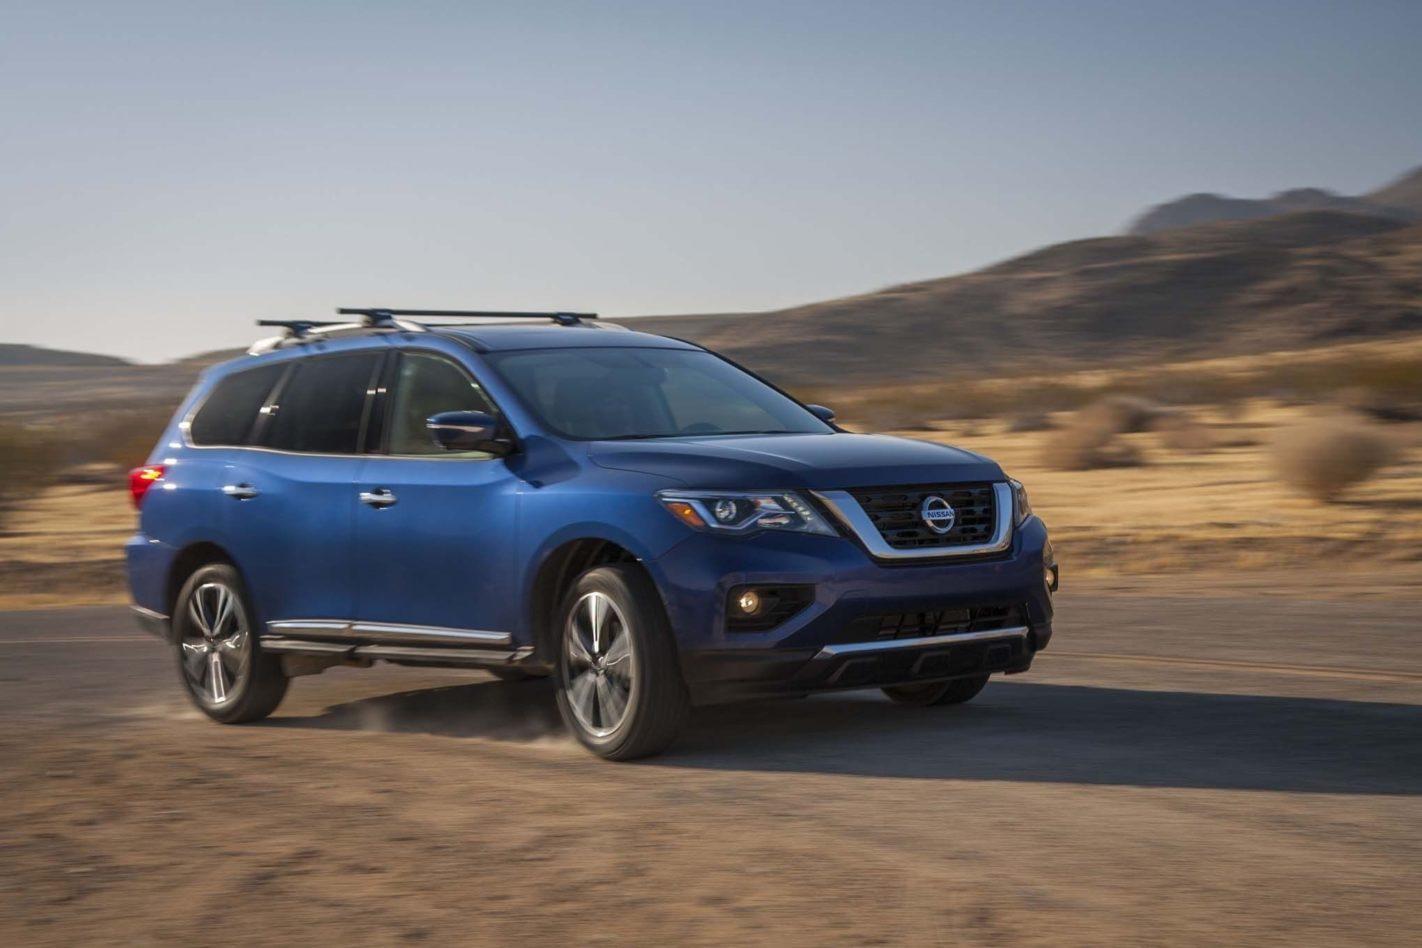 2019 Nissan Pathfinder Exterior Wallpapers Auto Car Rumors 1422x948